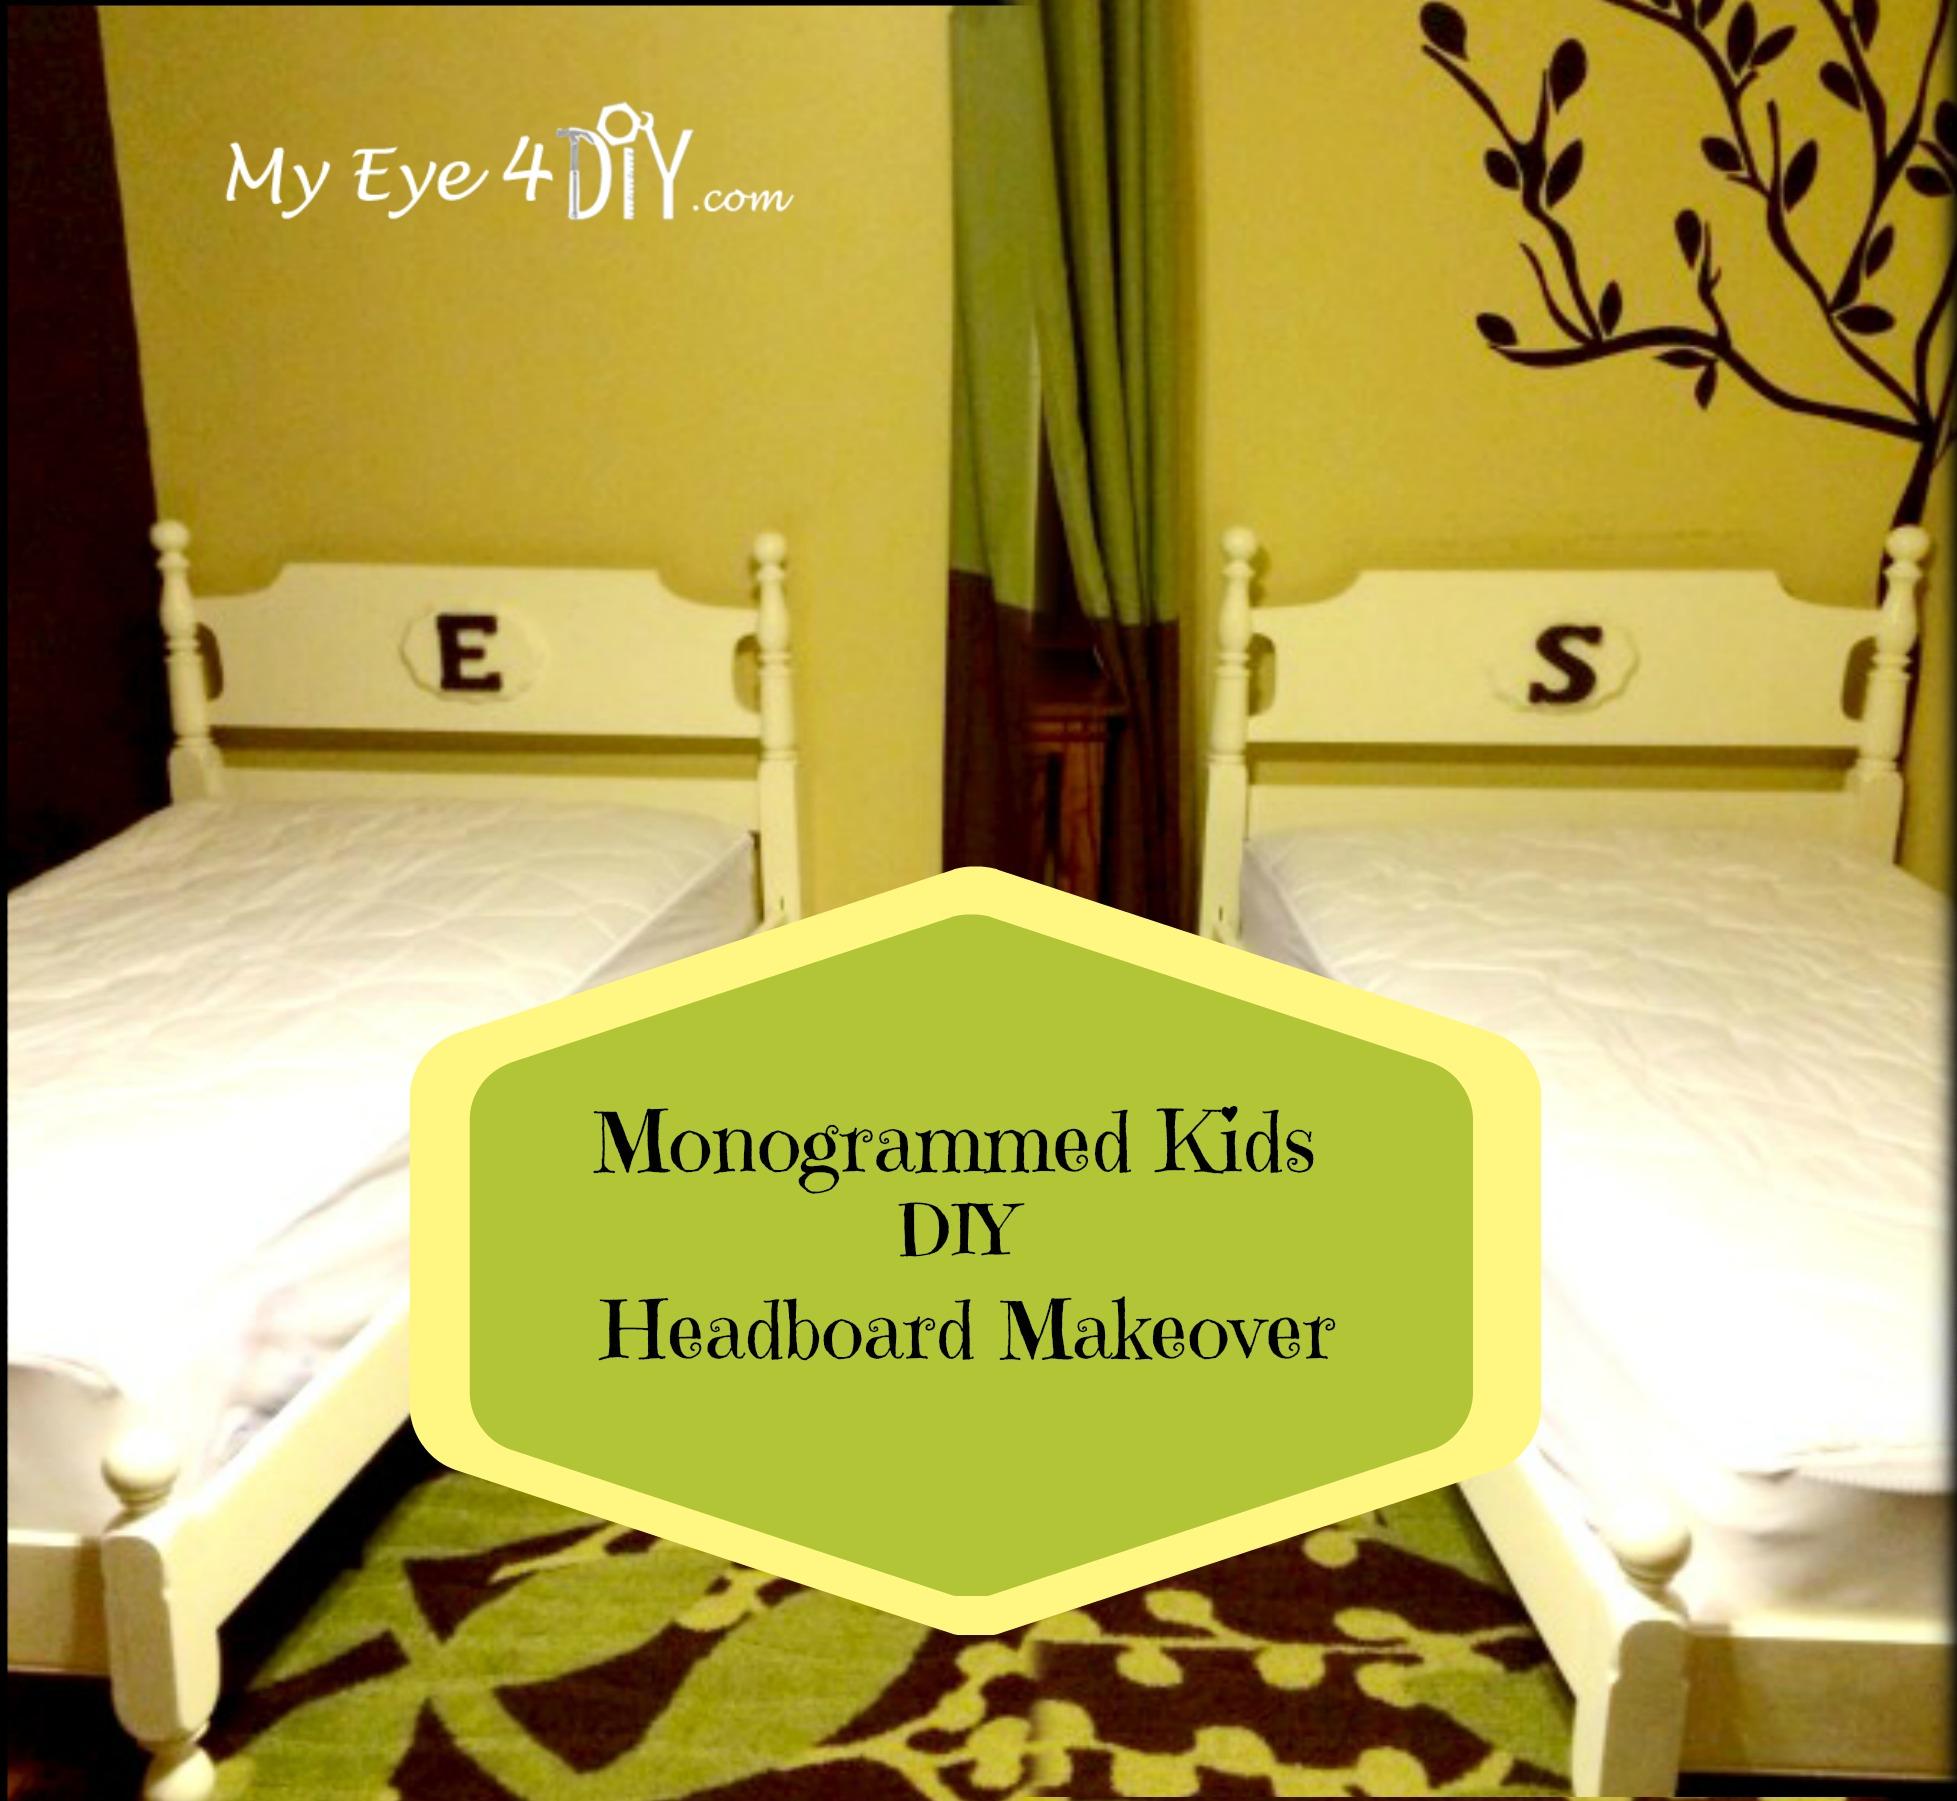 Monogrammed Kids Headboard Makeover Myeye4diycom